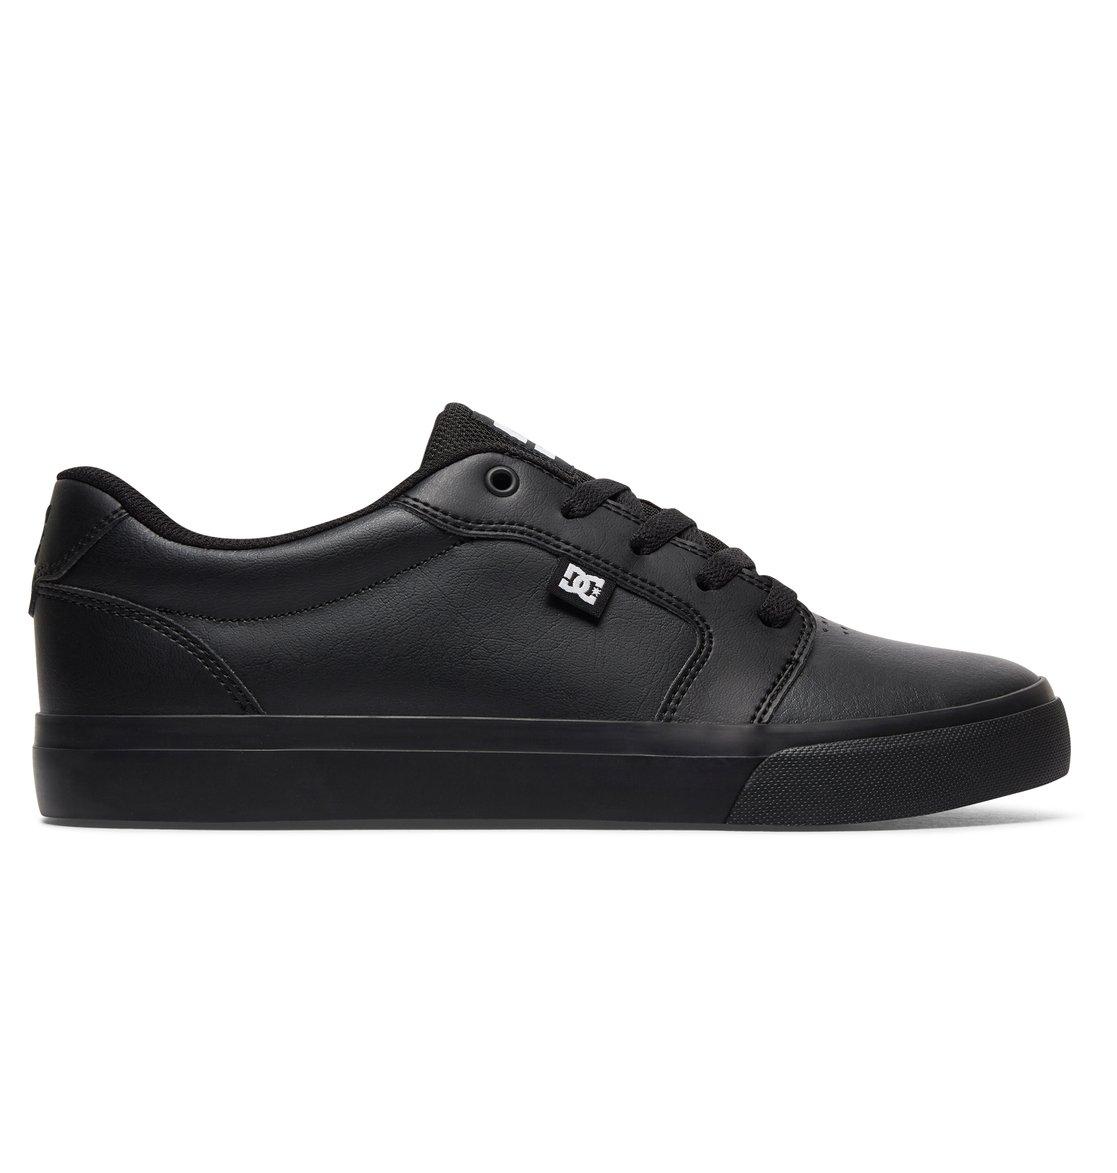 Dc Skateboard Shoes Anvil Se Black/black/black Size 11  41 EU B6x5s30